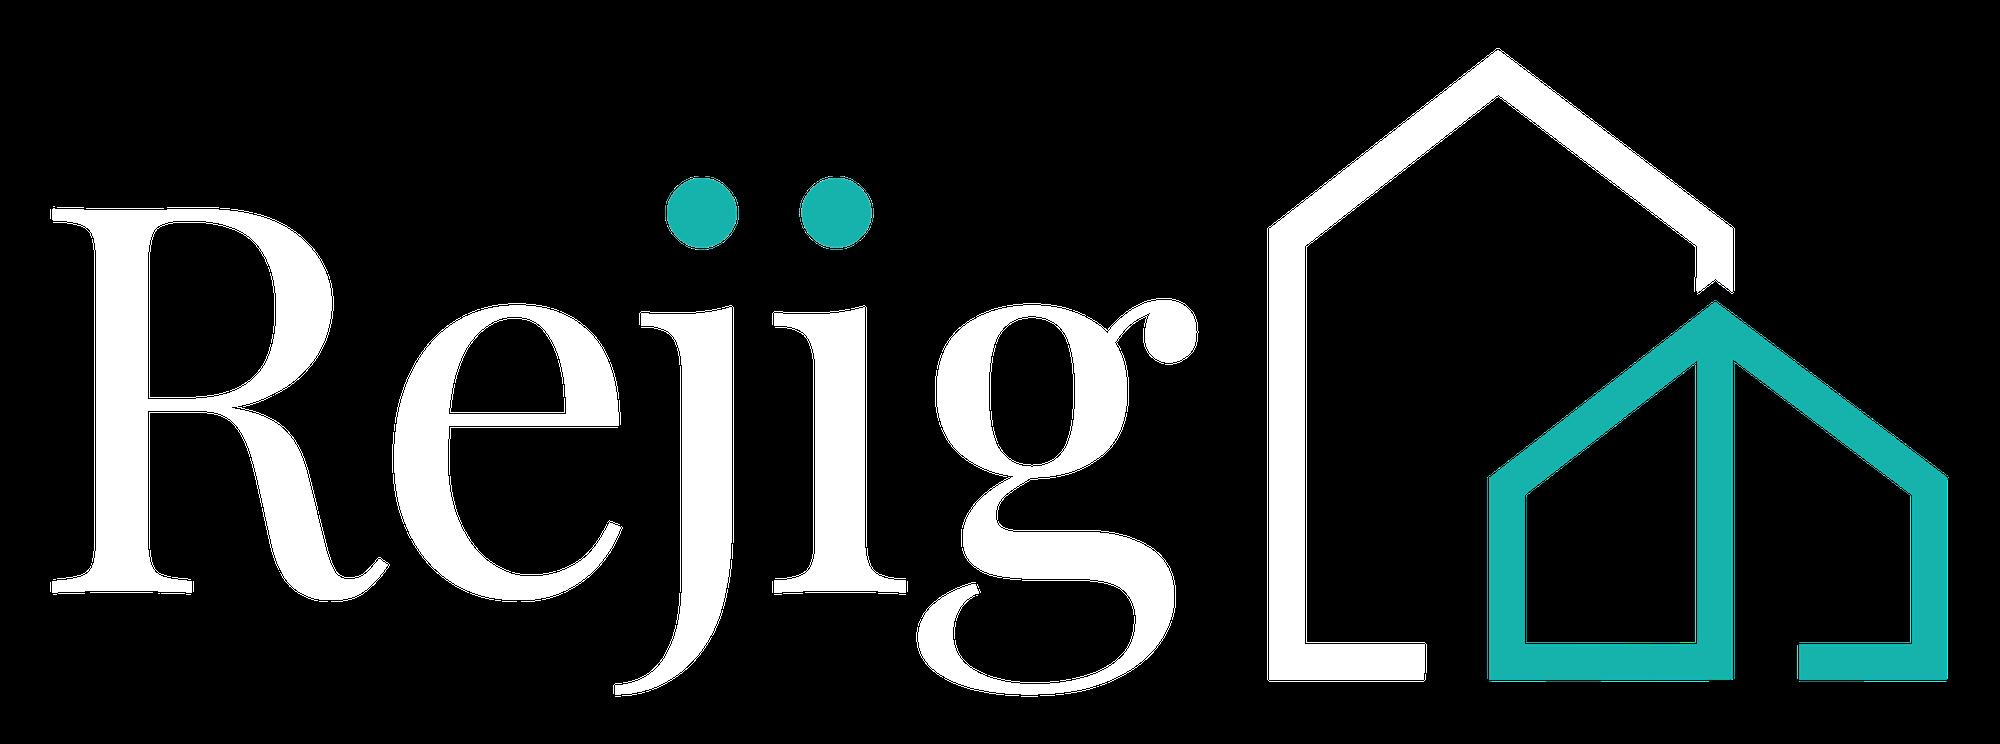 REJIG LOGO WHITE TEAL 1 1